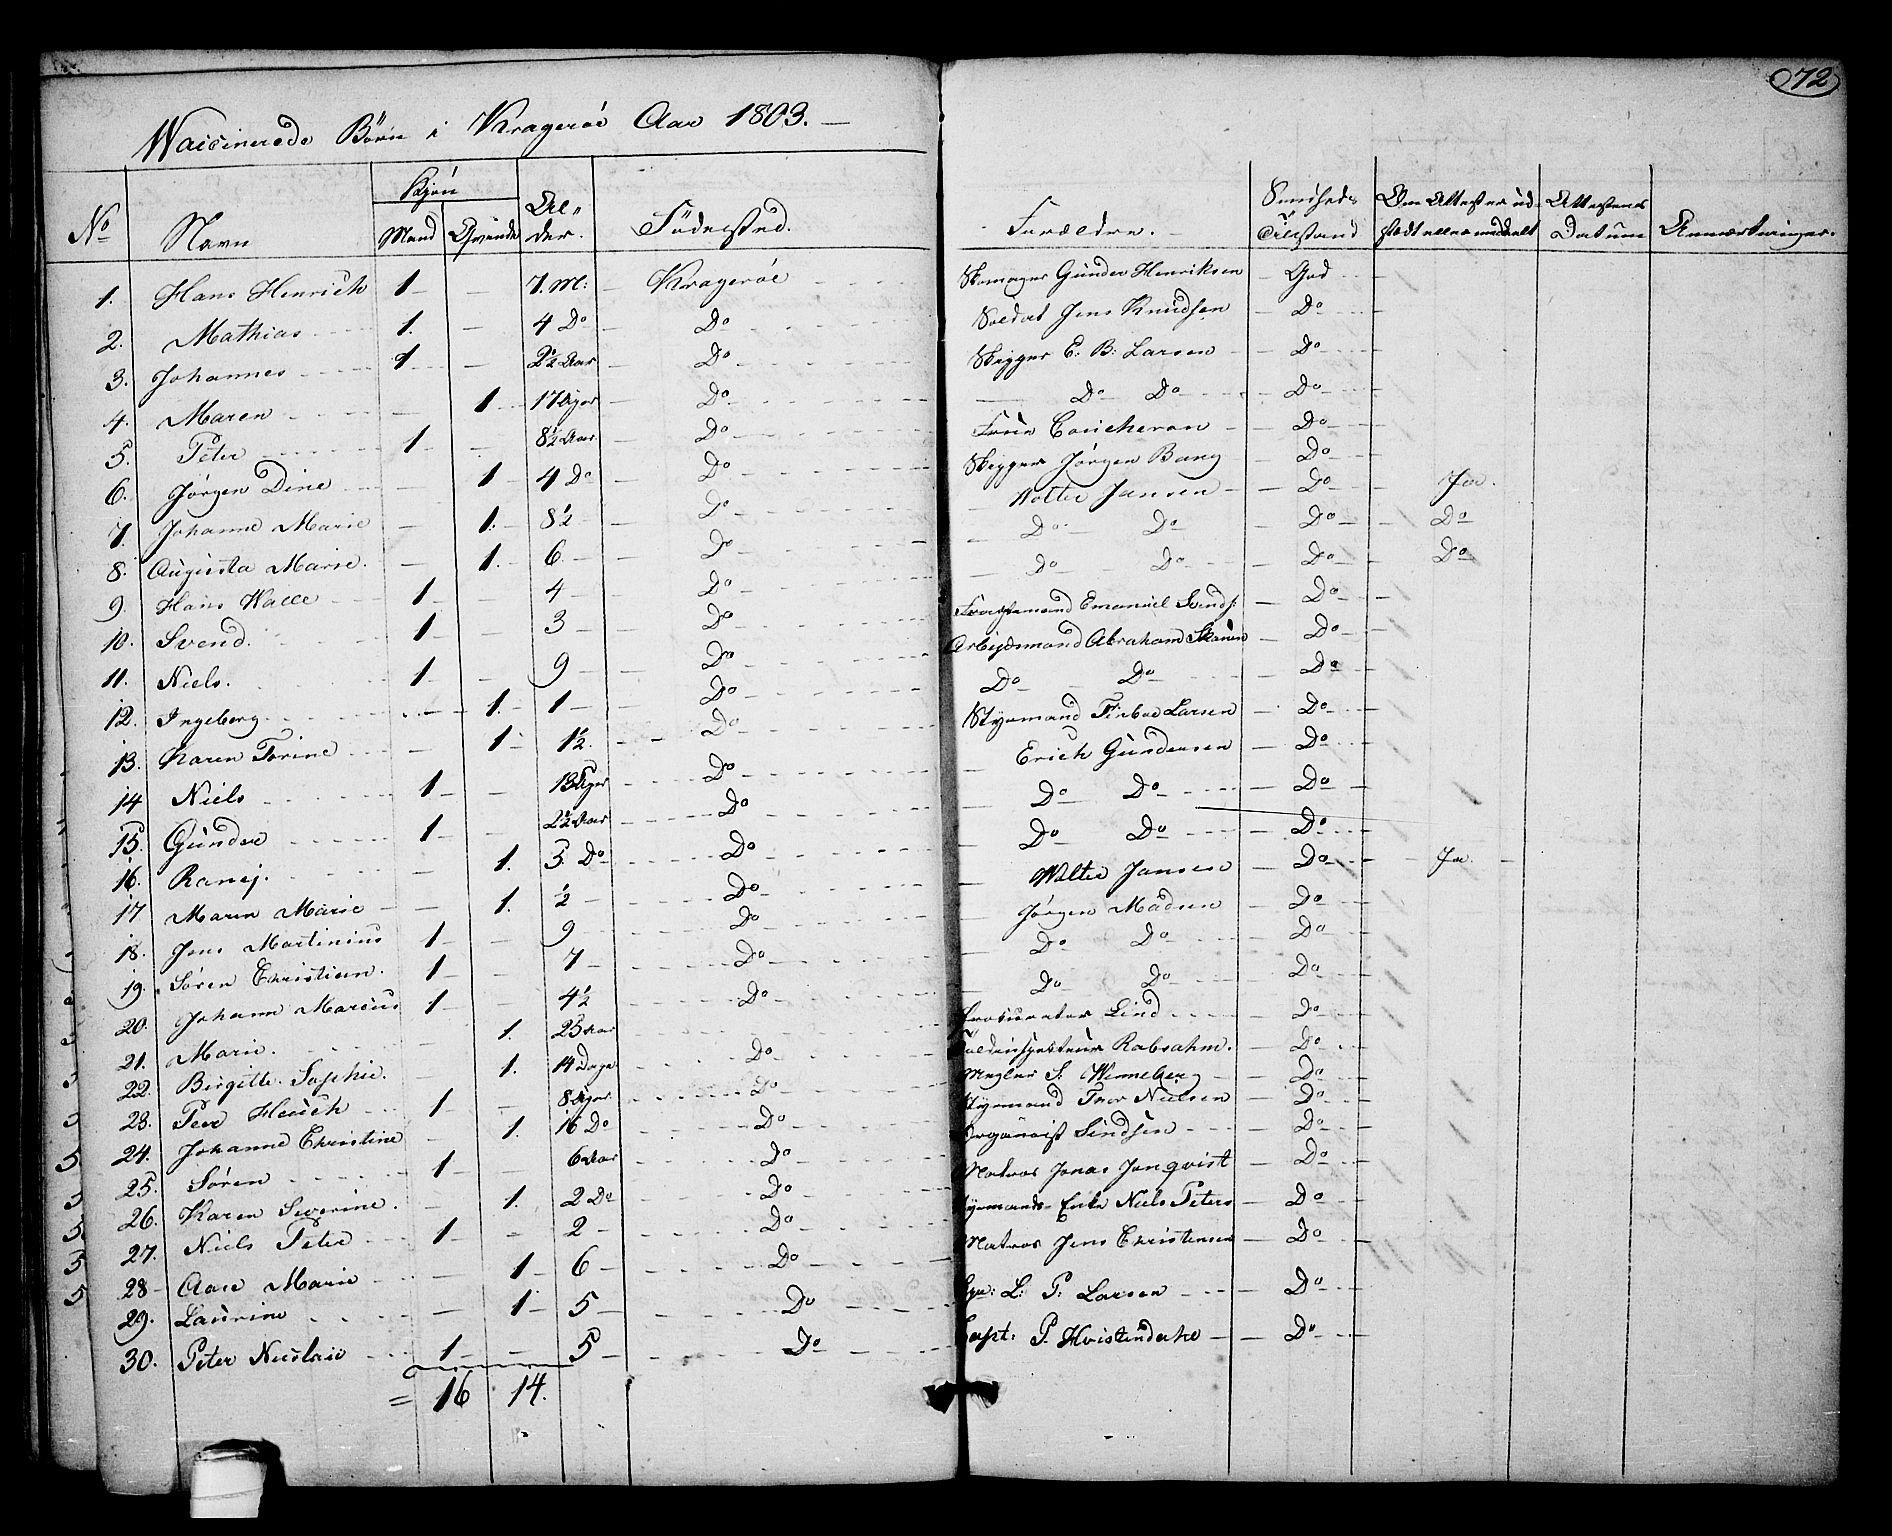 SAKO, Kragerø kirkebøker, F/Fa/L0003: Ministerialbok nr. 3, 1802-1813, s. 72